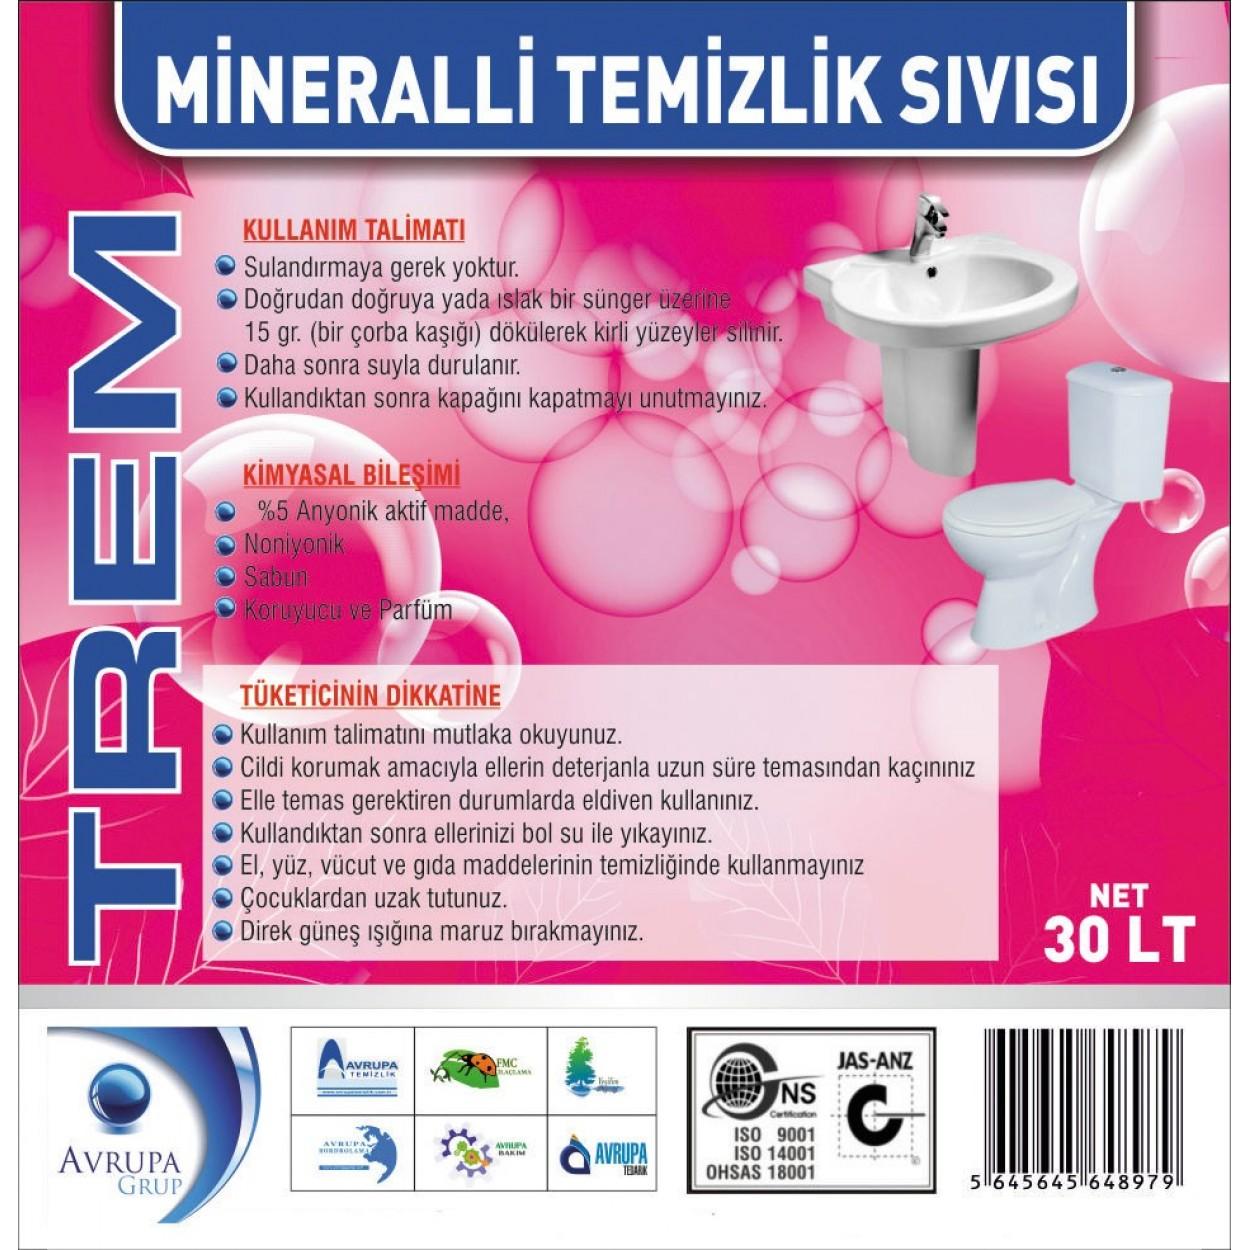 TREM Mineralli Temizlik Sıvısı 30 Litre